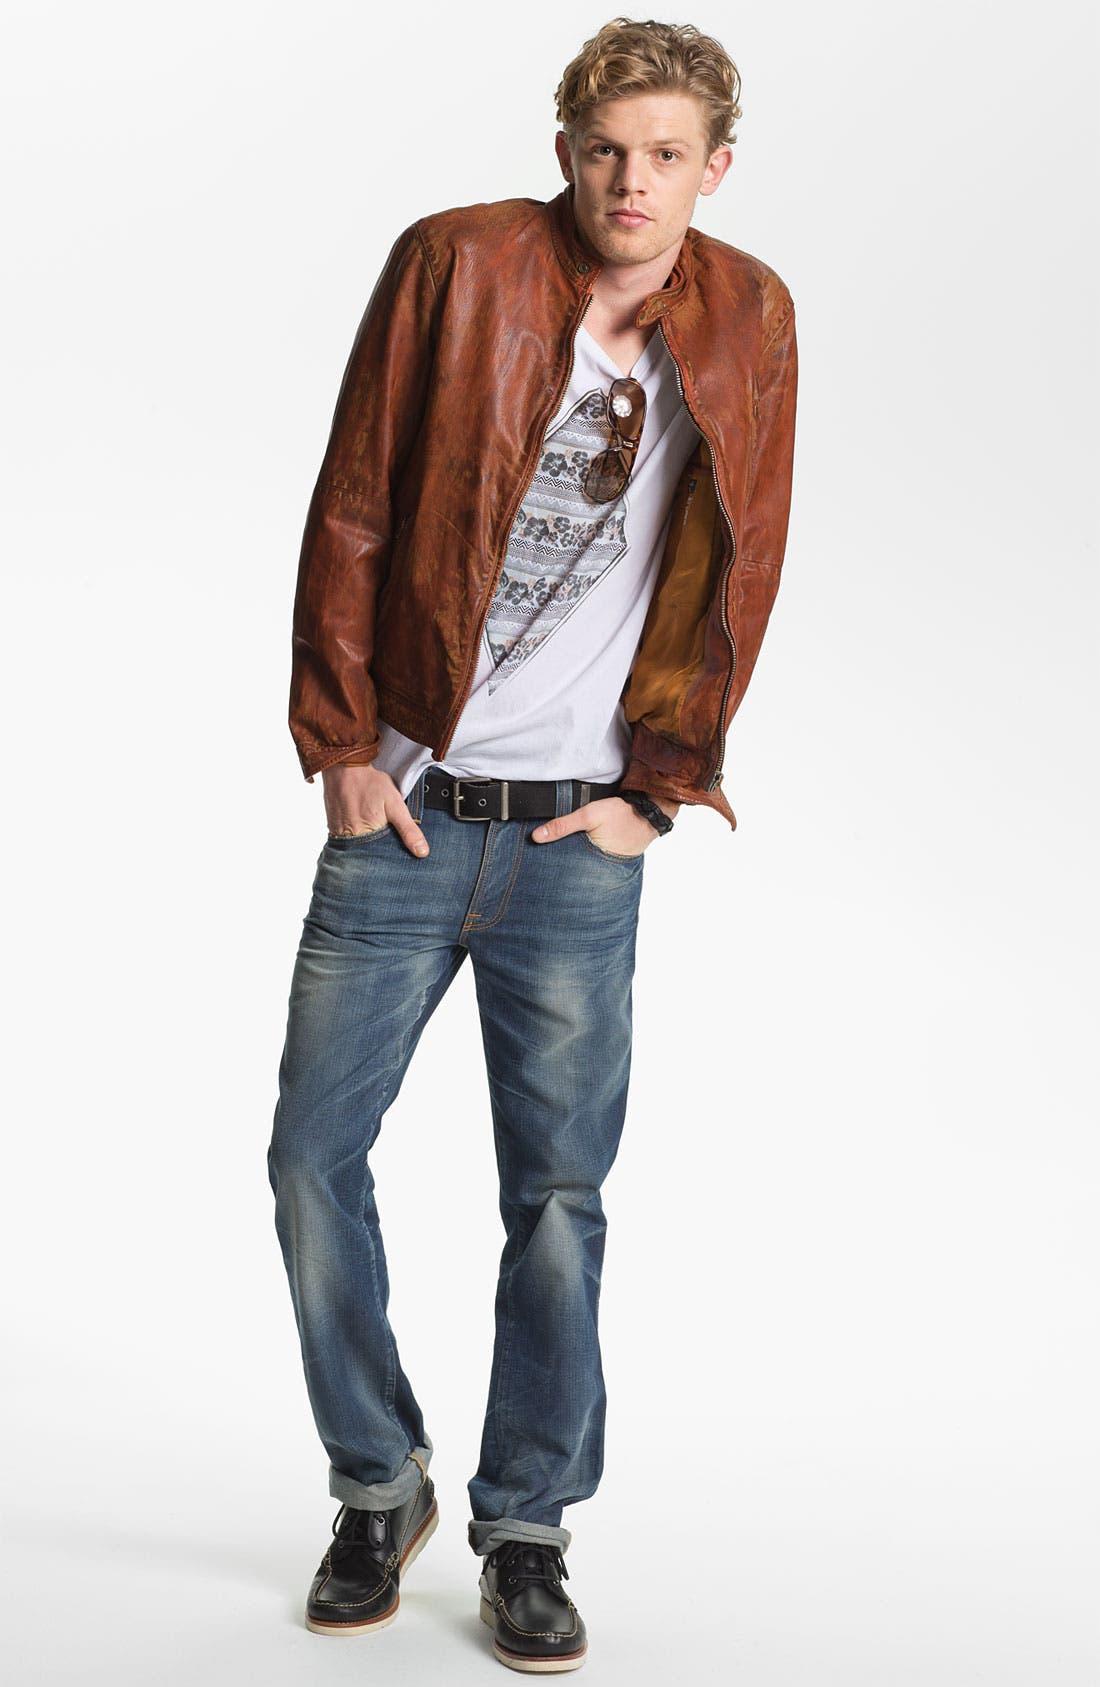 Alternate Image 1 Selected - Scotch & Soda Moto Jacket, Vanguard T-Shirt & Nudie Slim Straight Leg Jeans